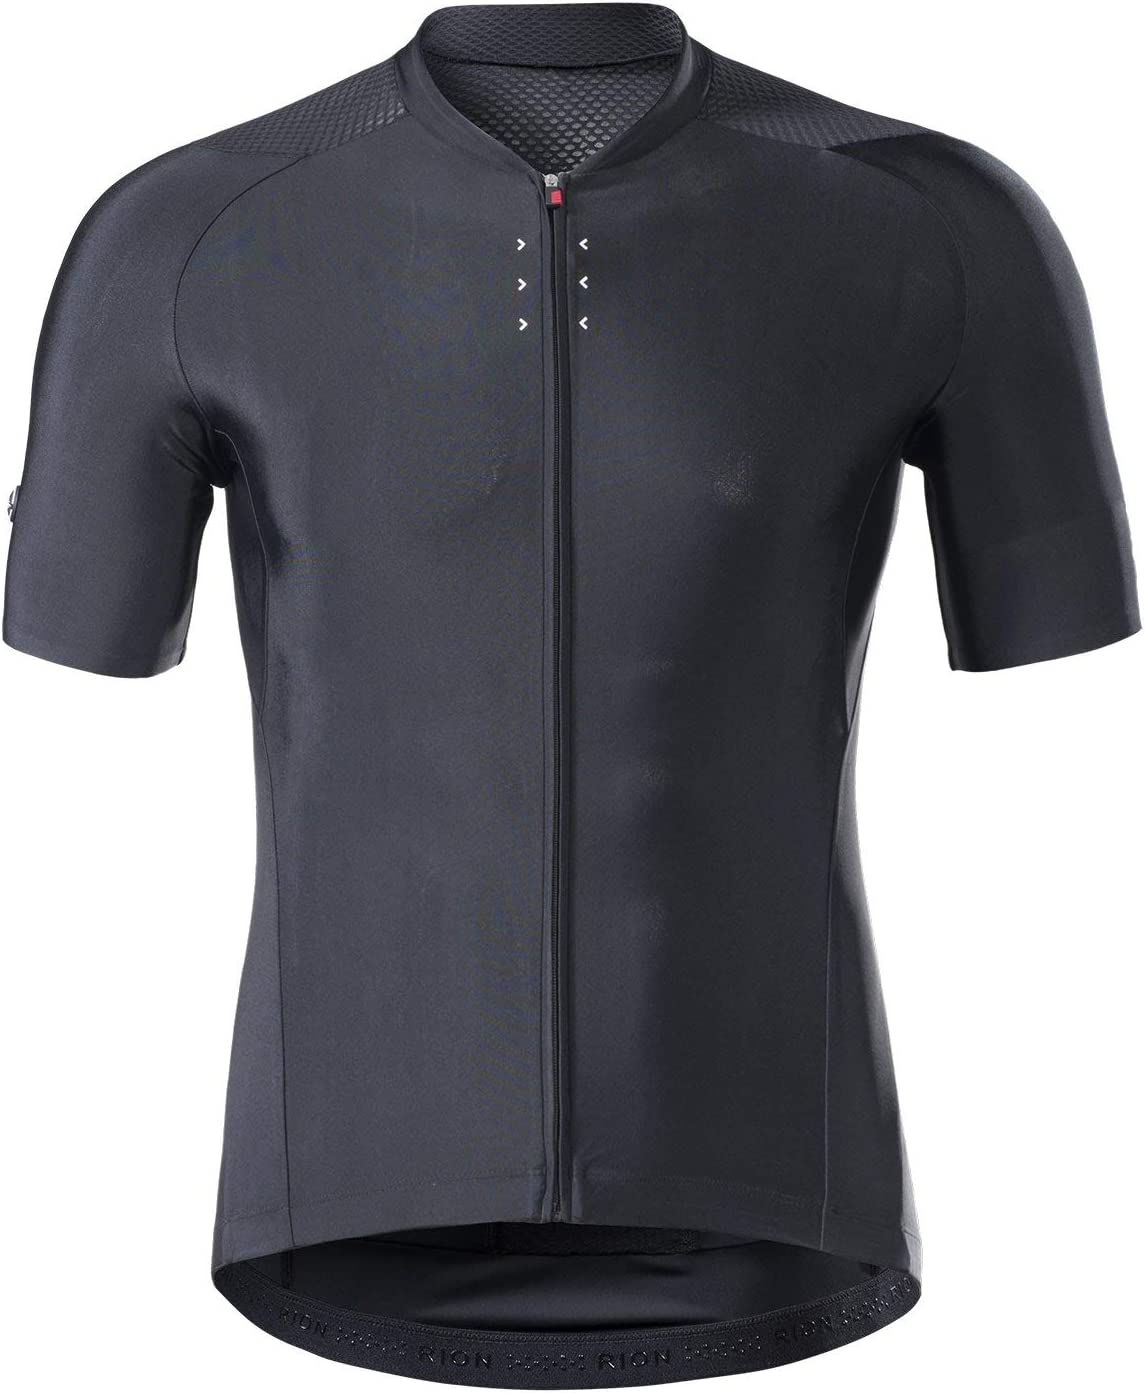 RION Men's Cycling Jersey Japan's largest Nashville-Davidson Mall assortment Breathable Sleeve Shirt Short Bike Top